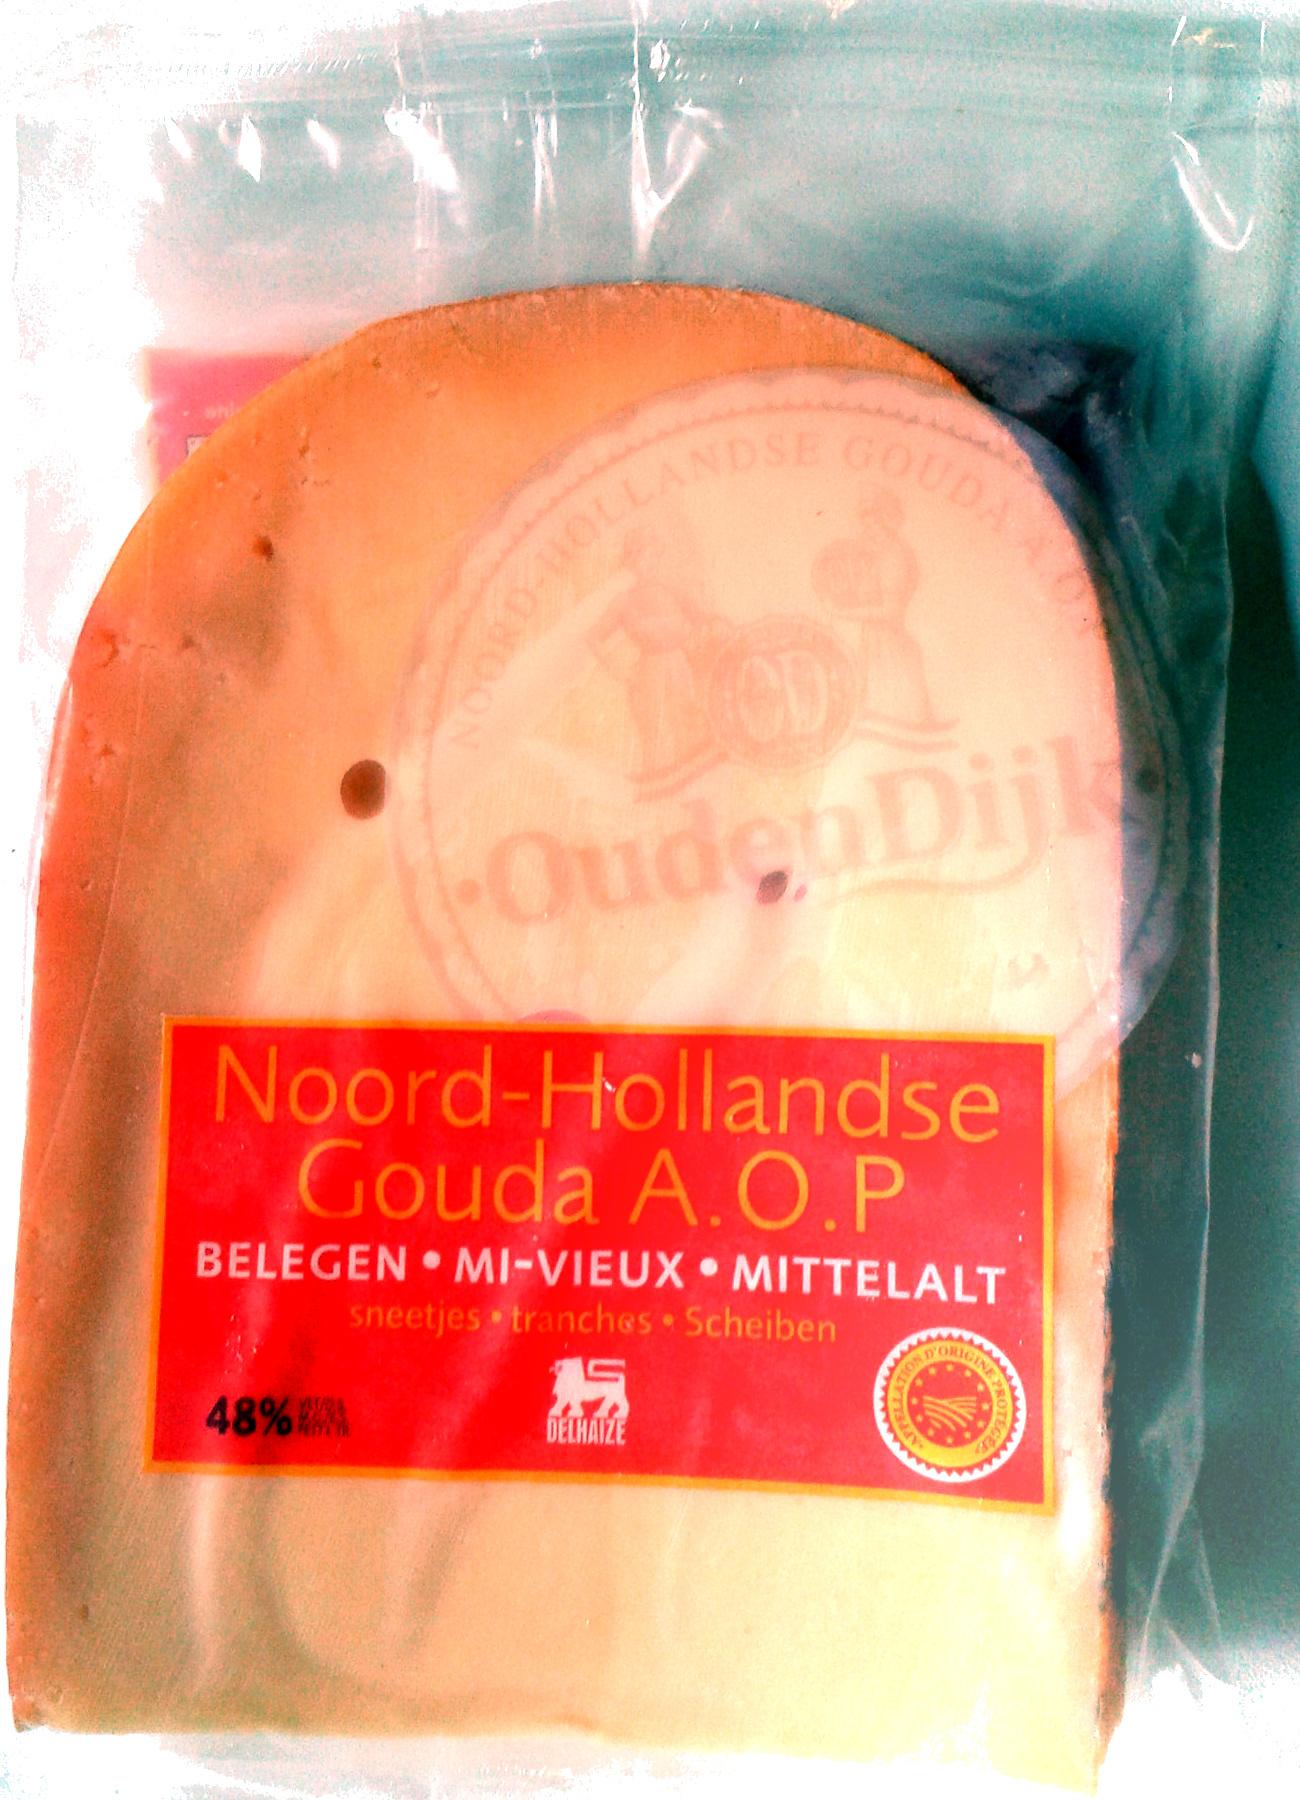 Noord-Hollandse mi-vieux - Product - fr